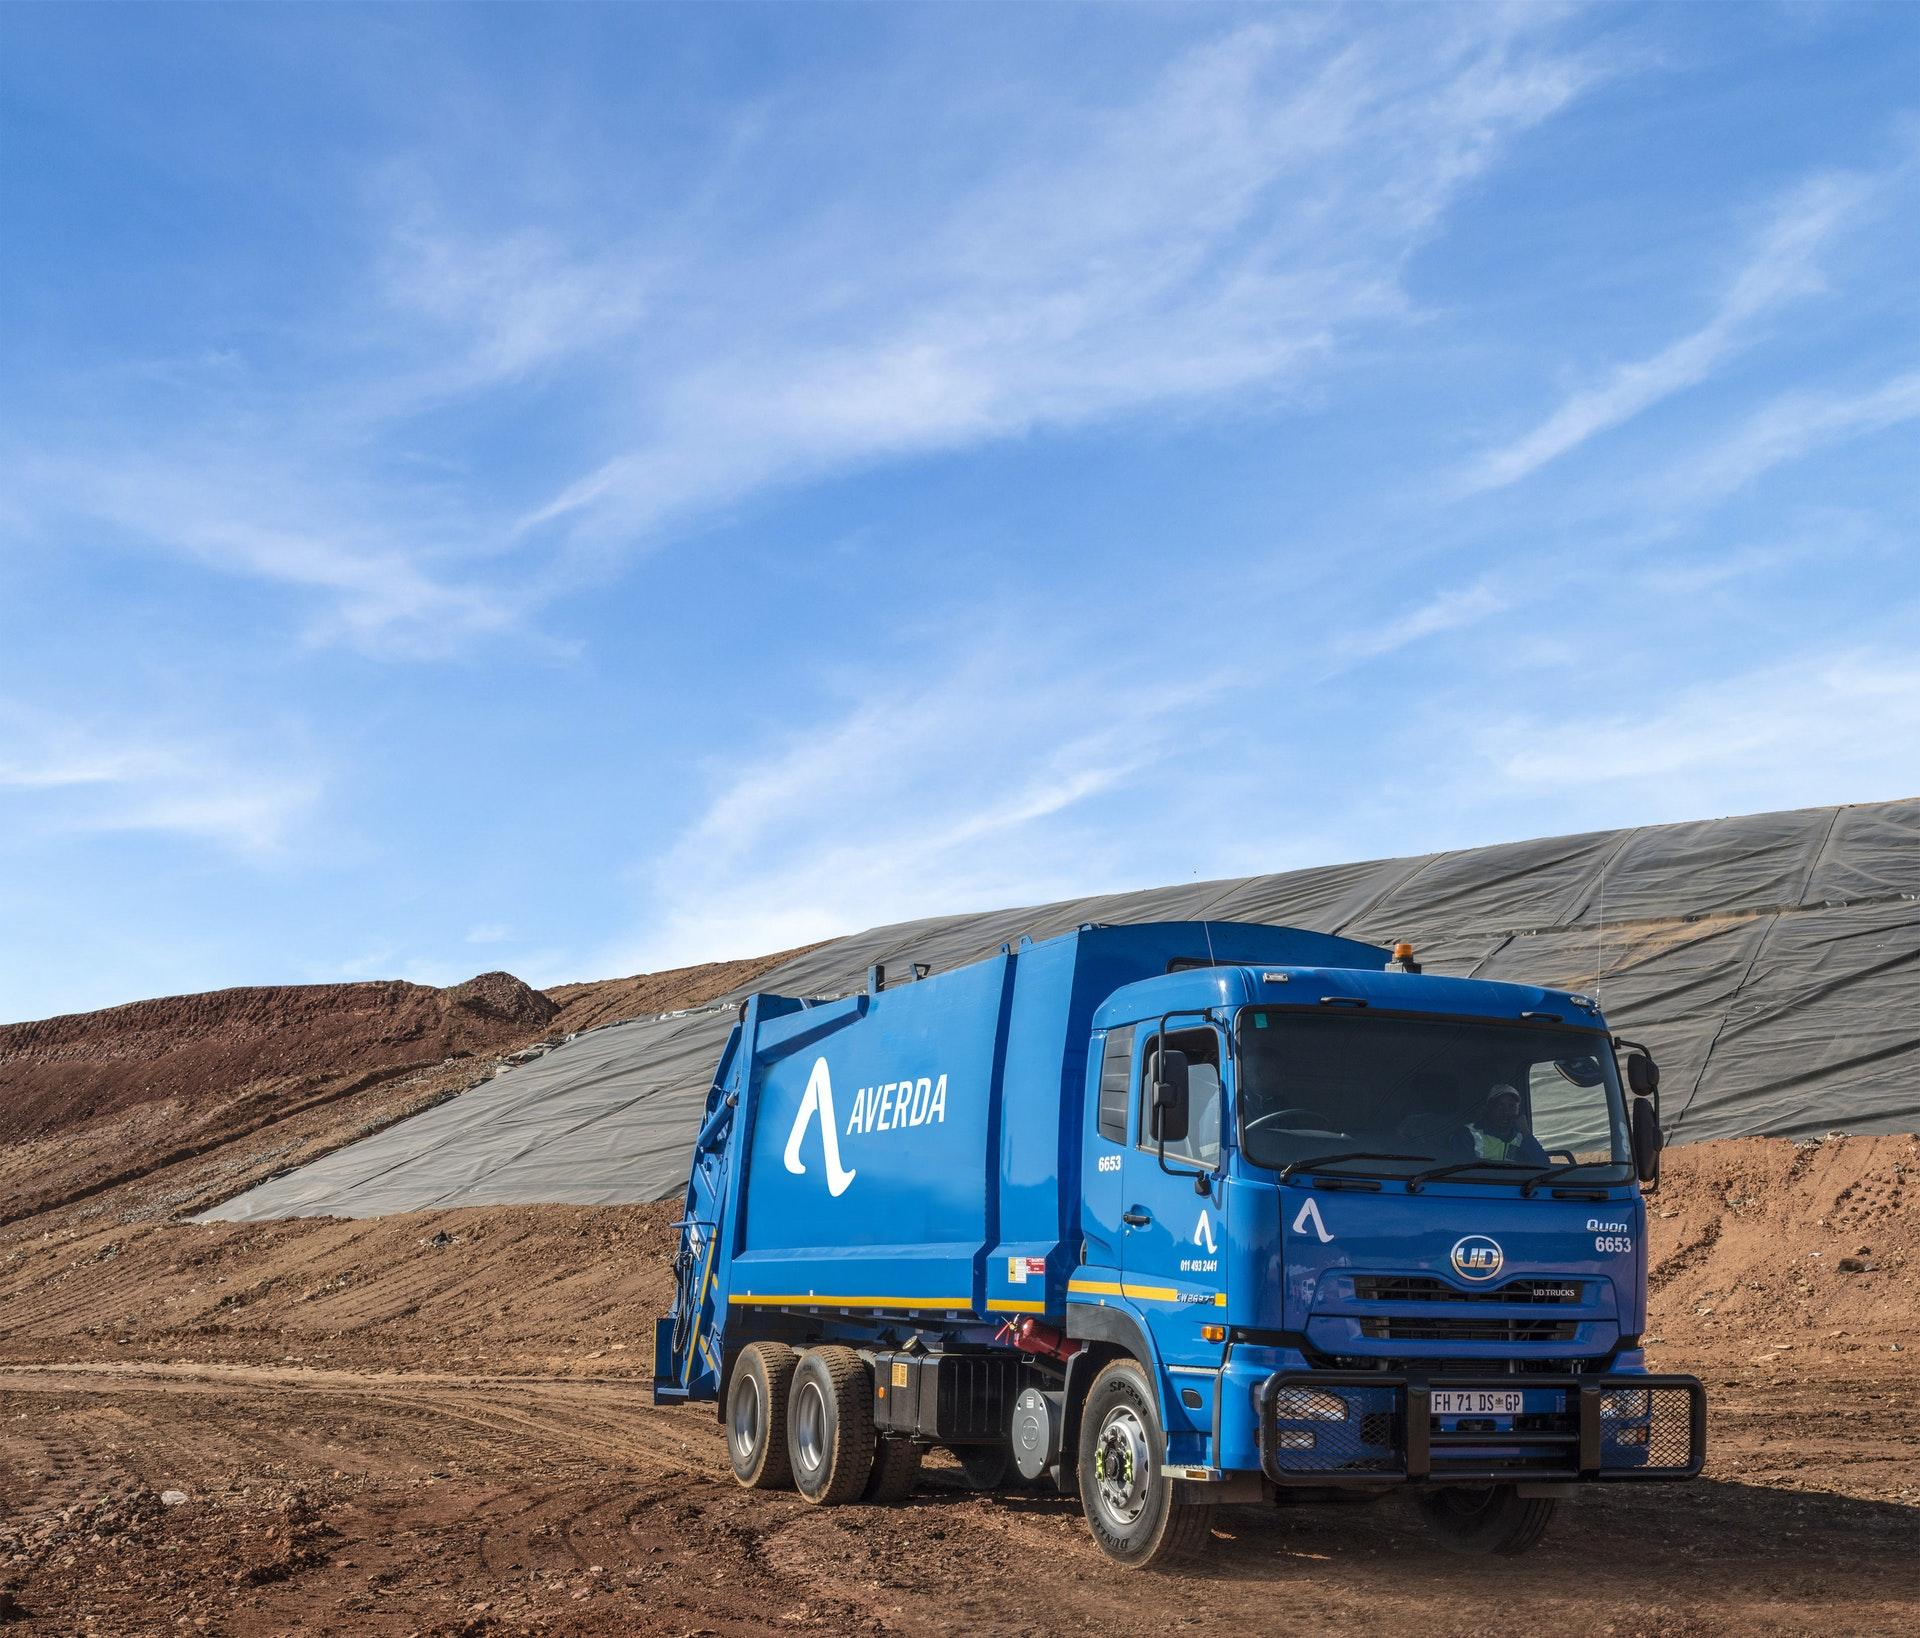 Vlakfontein SA Truck in Landfill